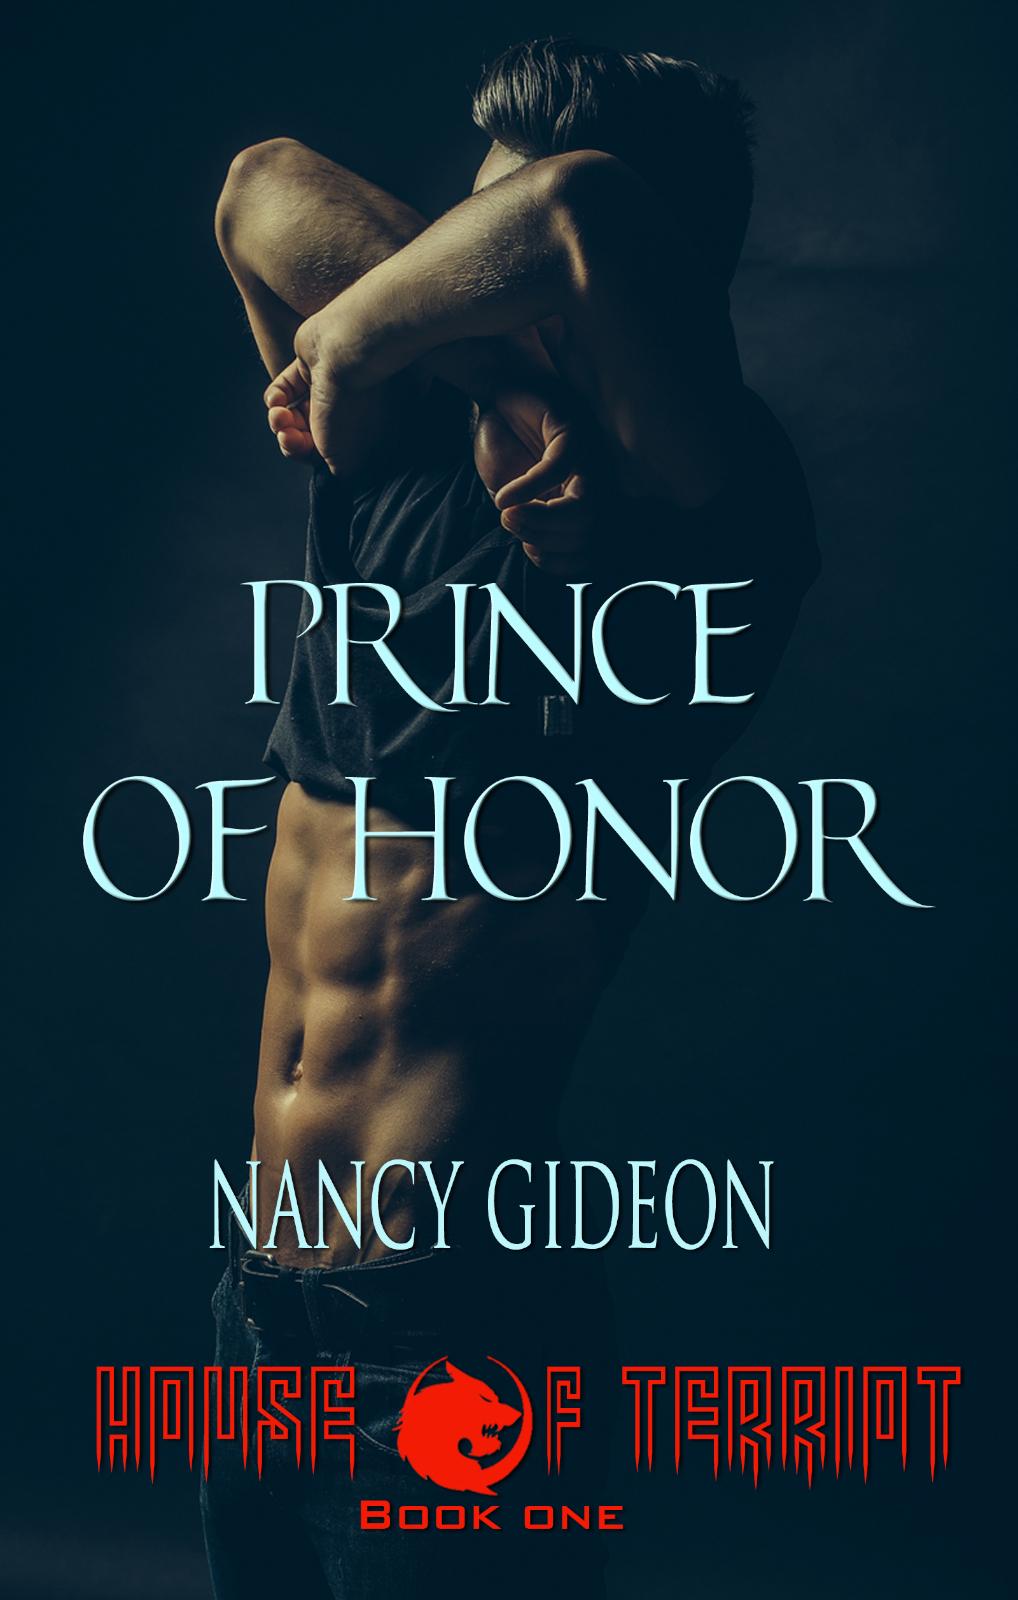 Prince of Honor